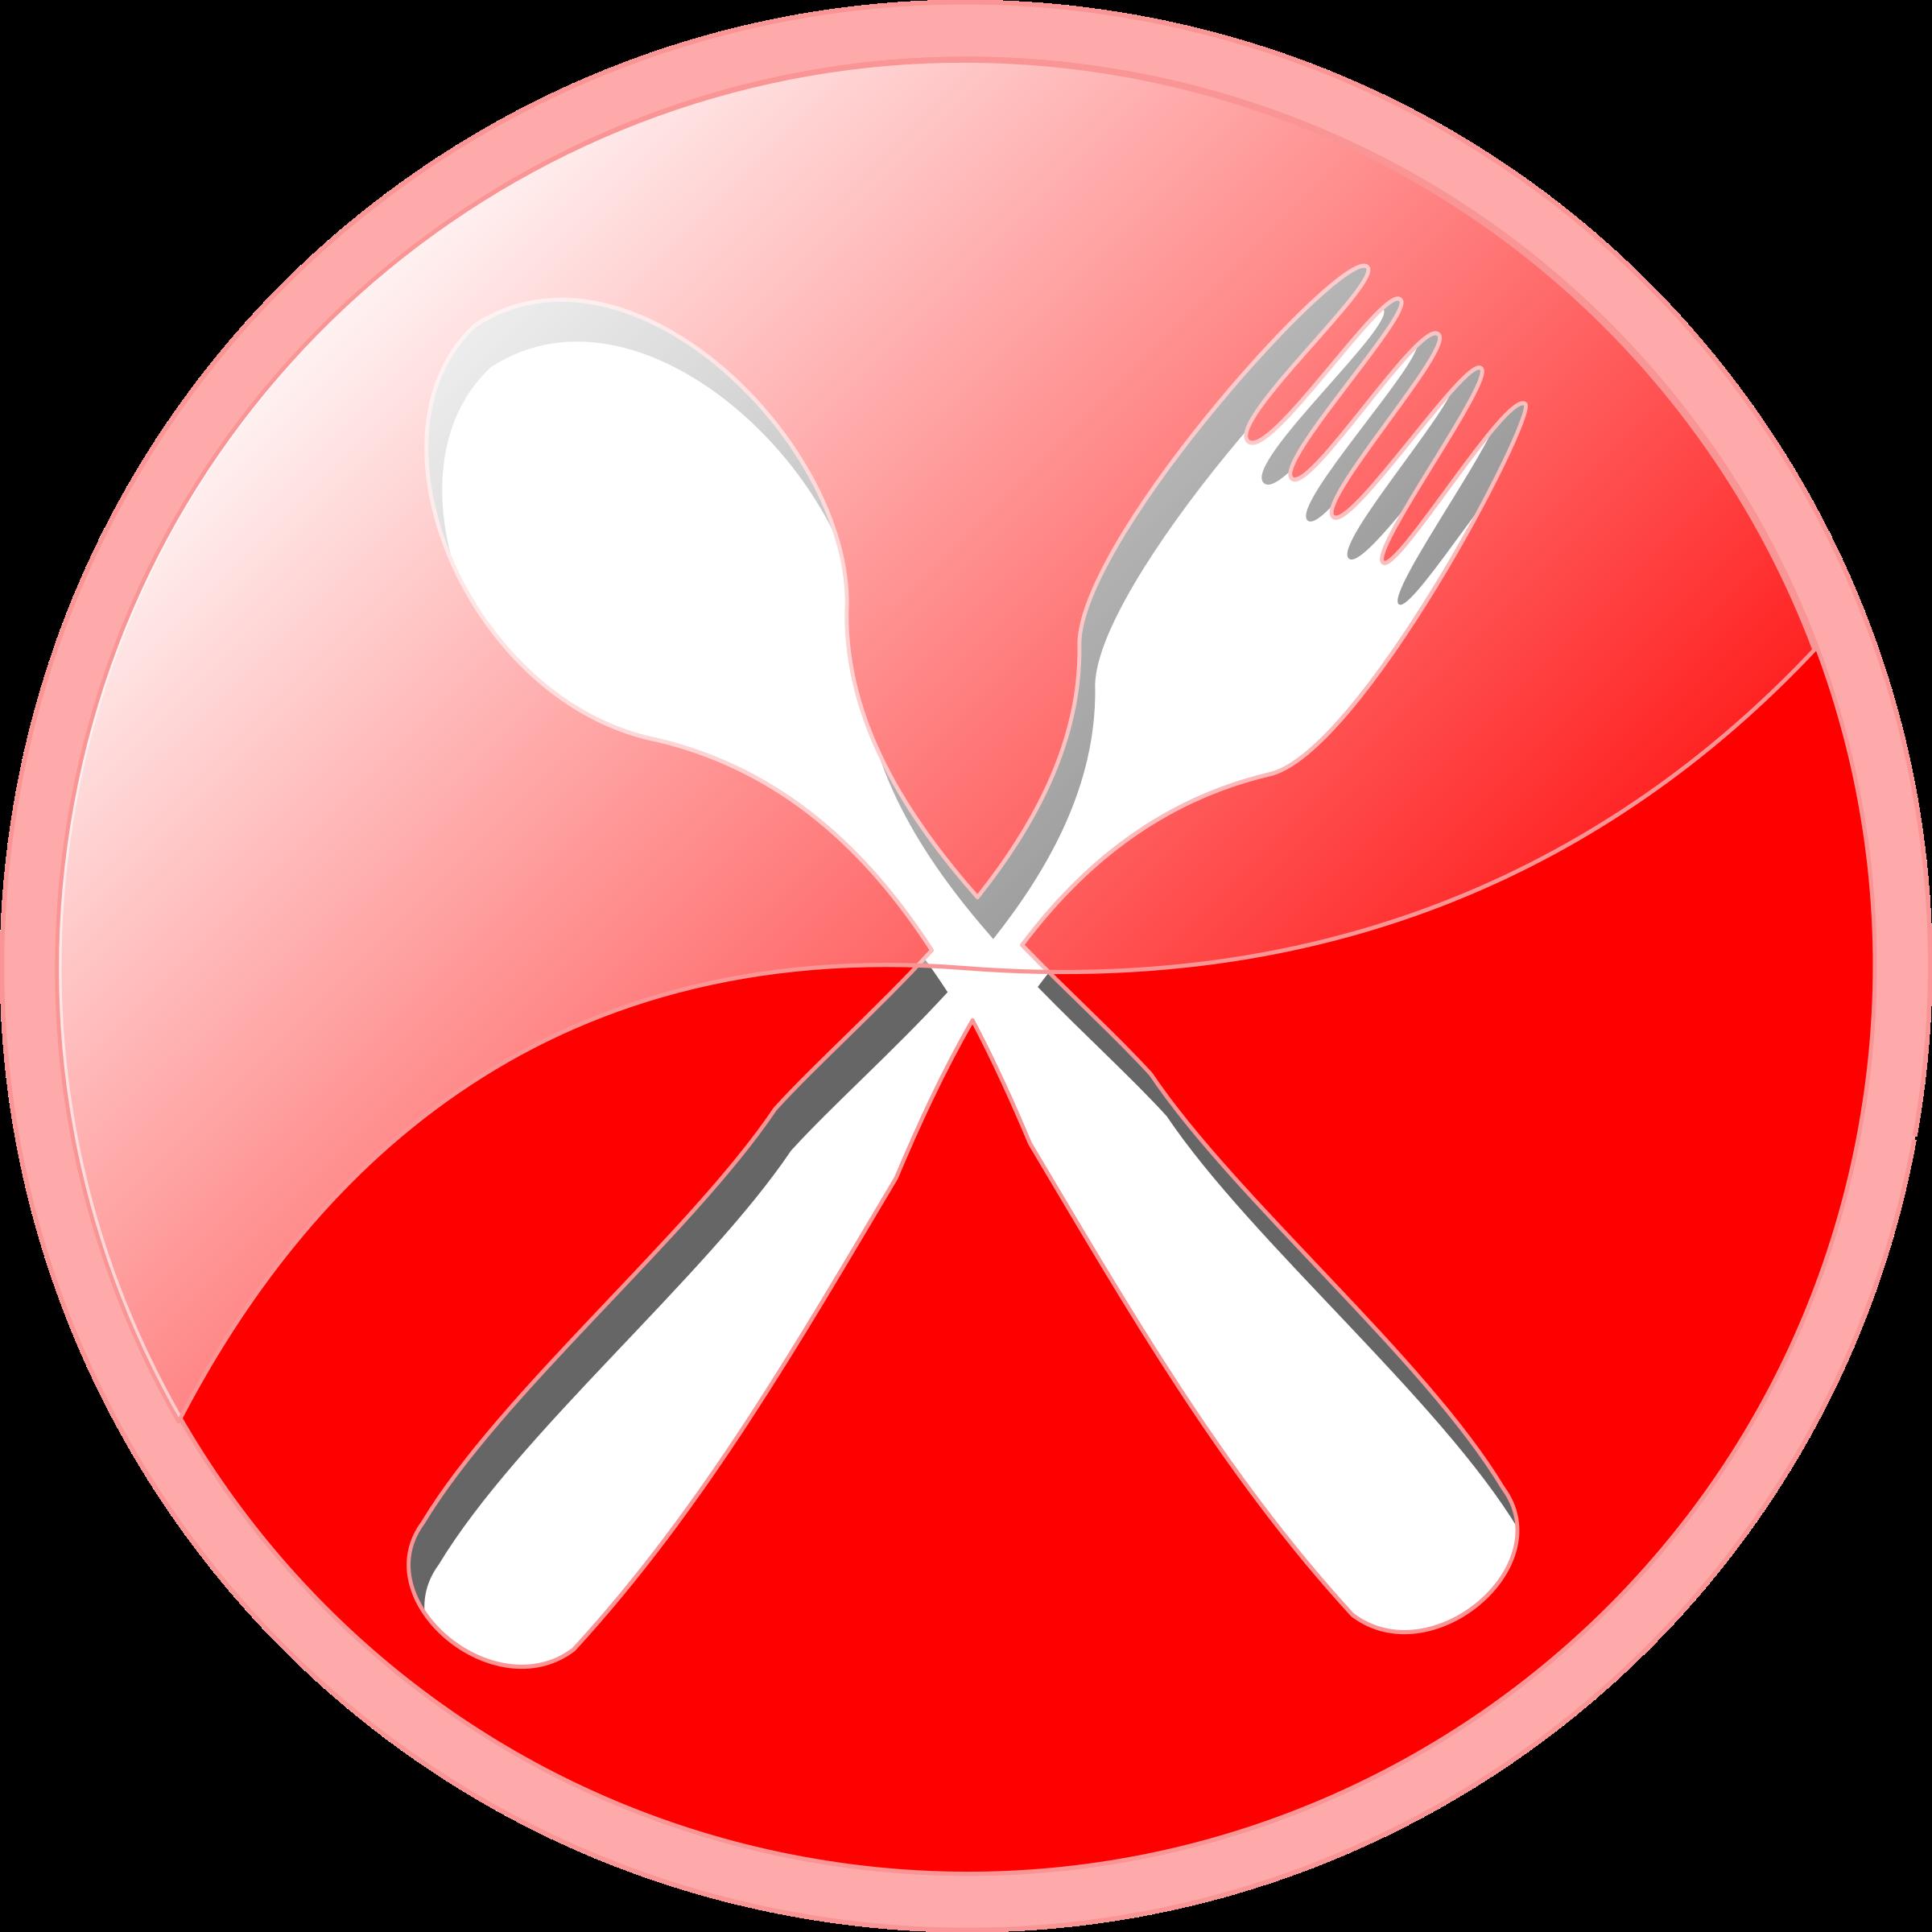 graphic library download Menu clipart restorent. Restaurant big image png.